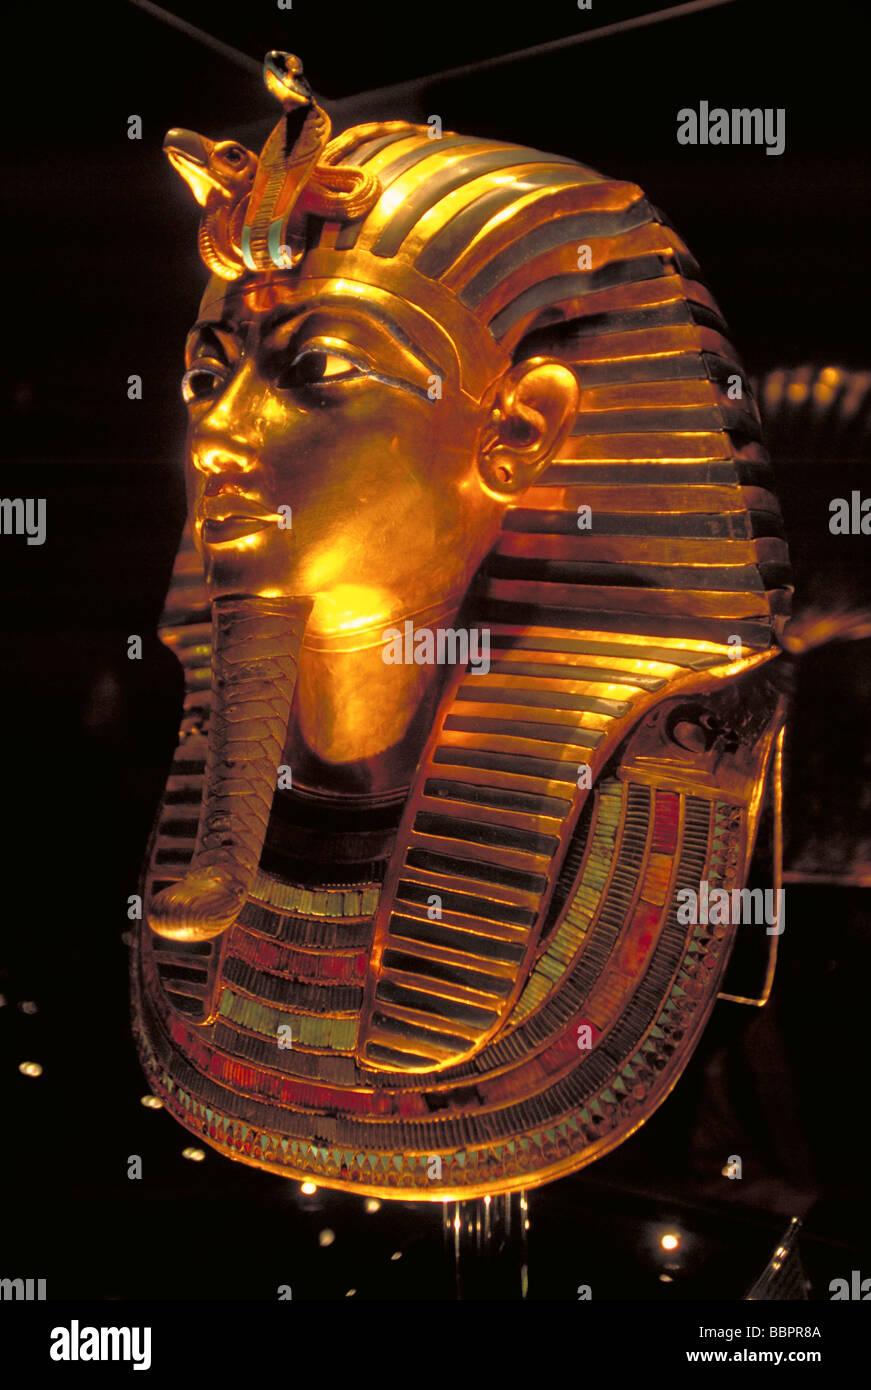 Elk157 1238 Egypt Cairo Egyptian Museum tomb of Tutankhamun treasures 14th c BC funerary mask - Stock Image